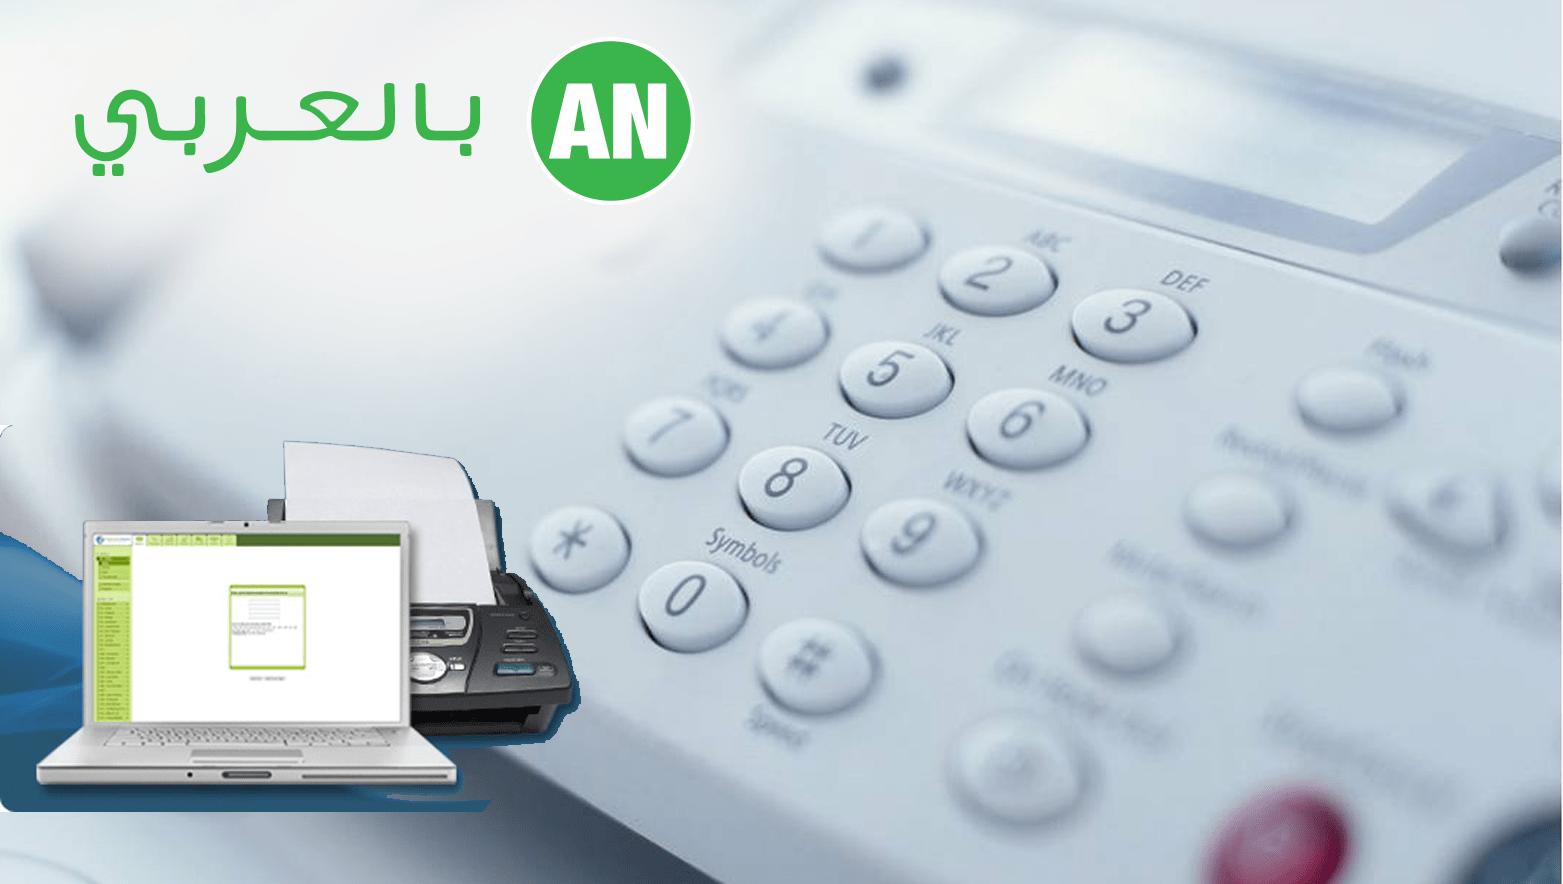 Photo of كيفية ارسال الفاكس عبر الانترنت Online Fax